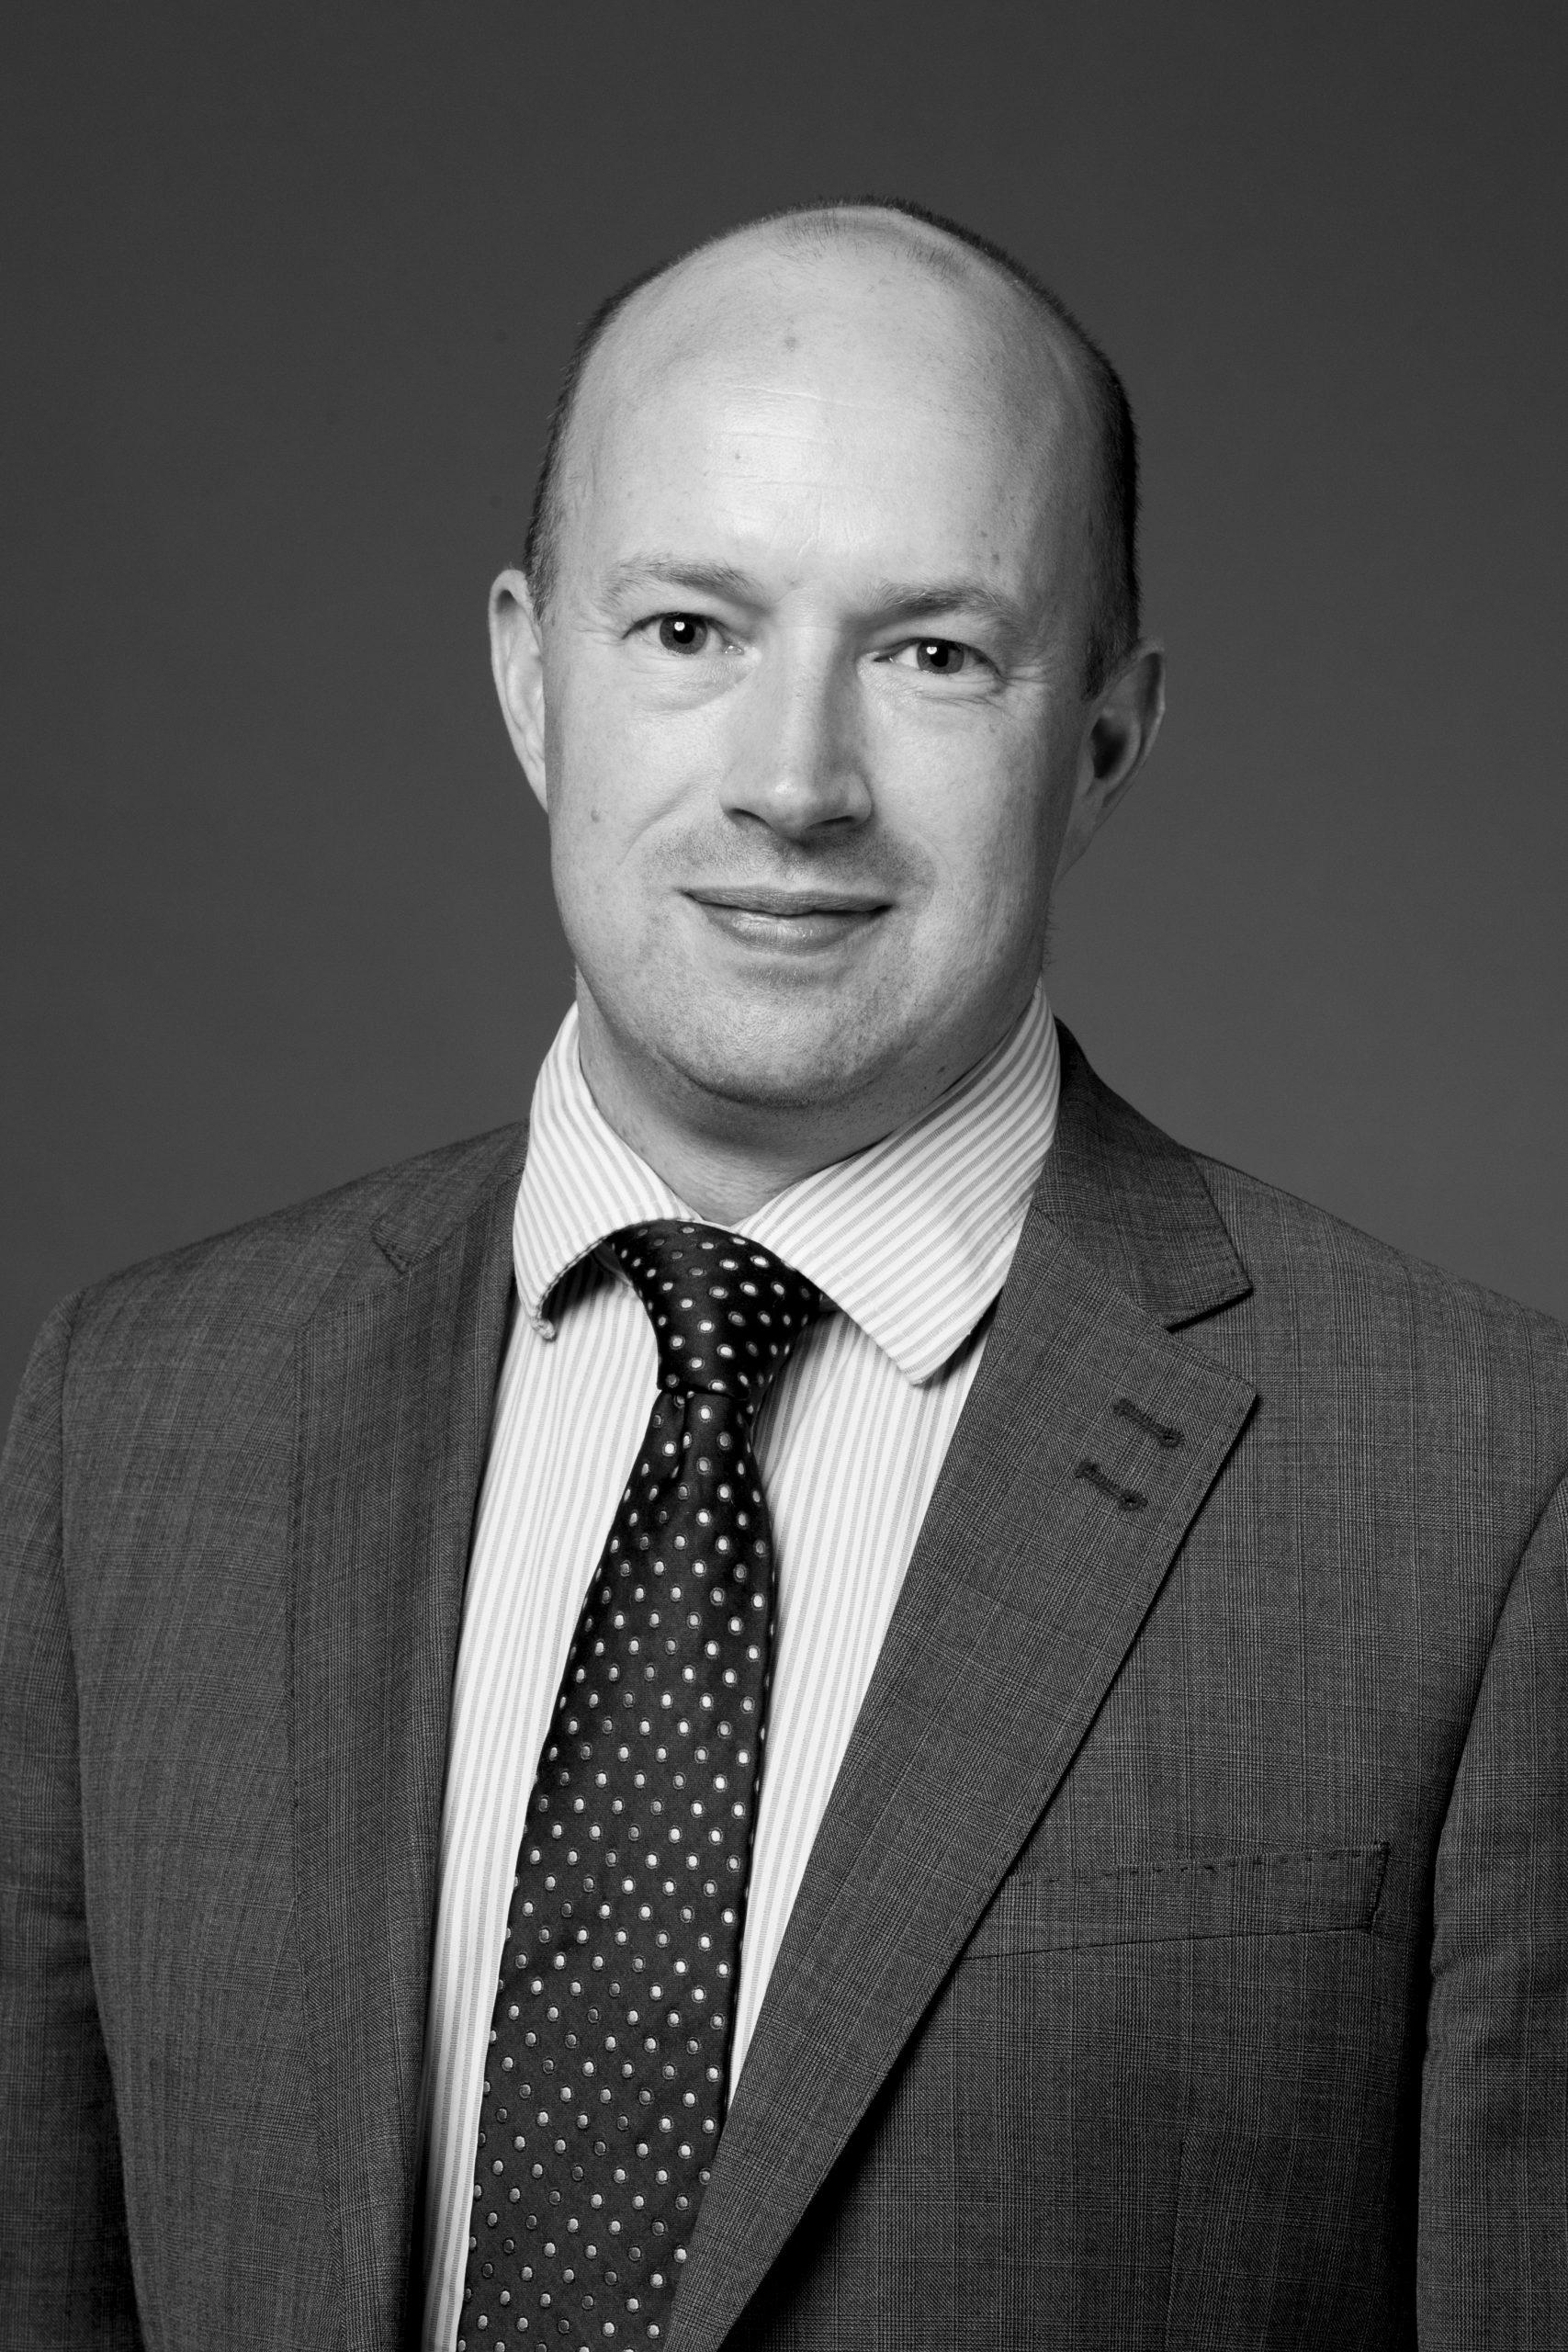 Mike Yarwood, Speaker at Cool Logistics Middle East 2021